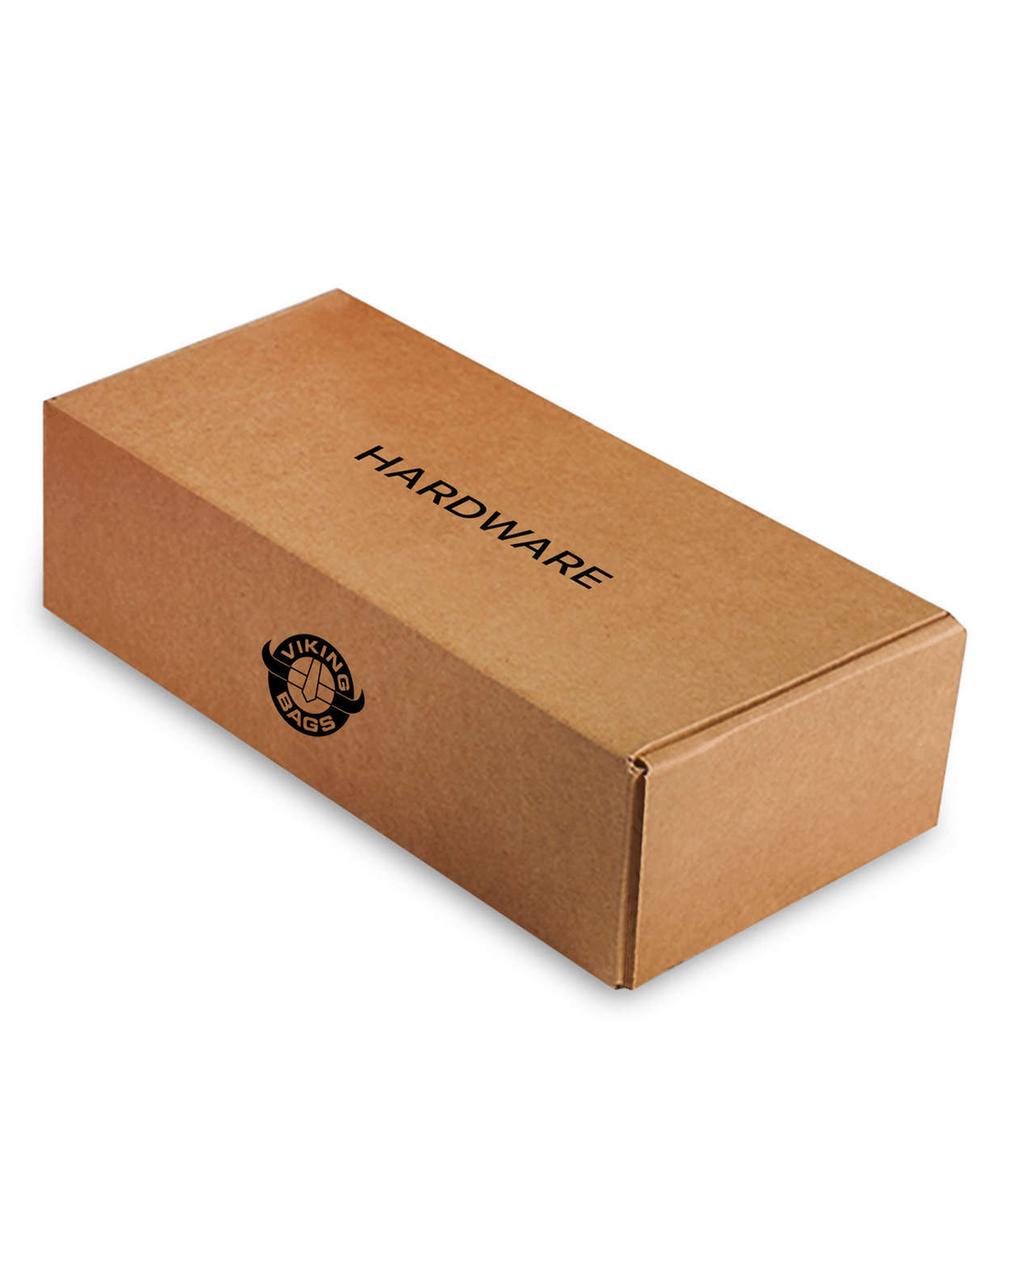 Honda VF750C Magna 750 Viking Lamellar Leather Covered Shock Cutout Hard Saddlebag Hardware box